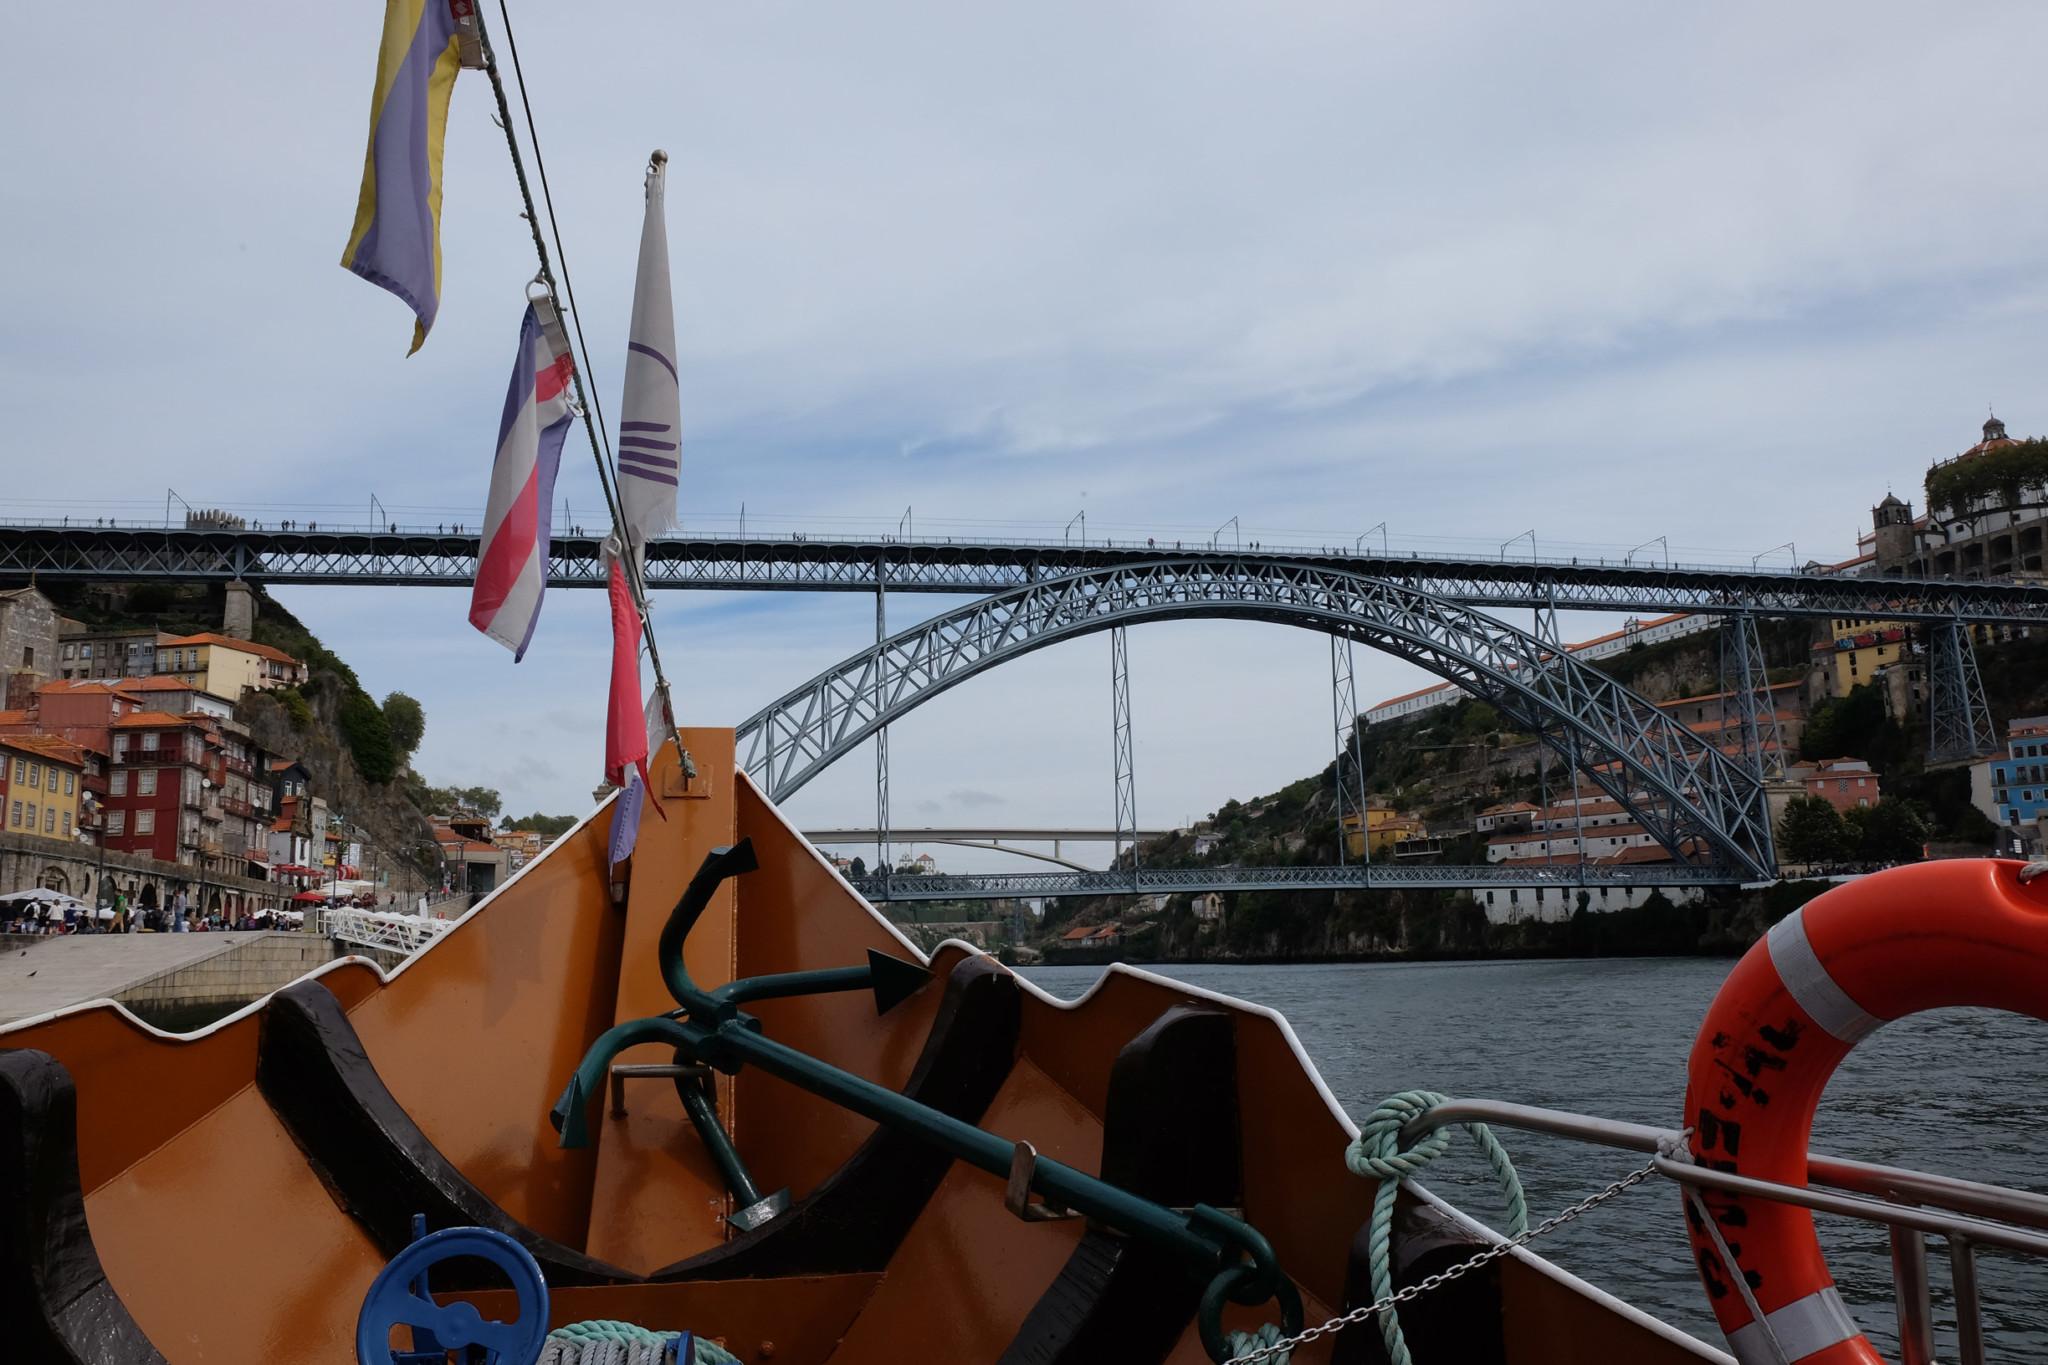 Boat trip on the Douro river under the six bridges of Porto